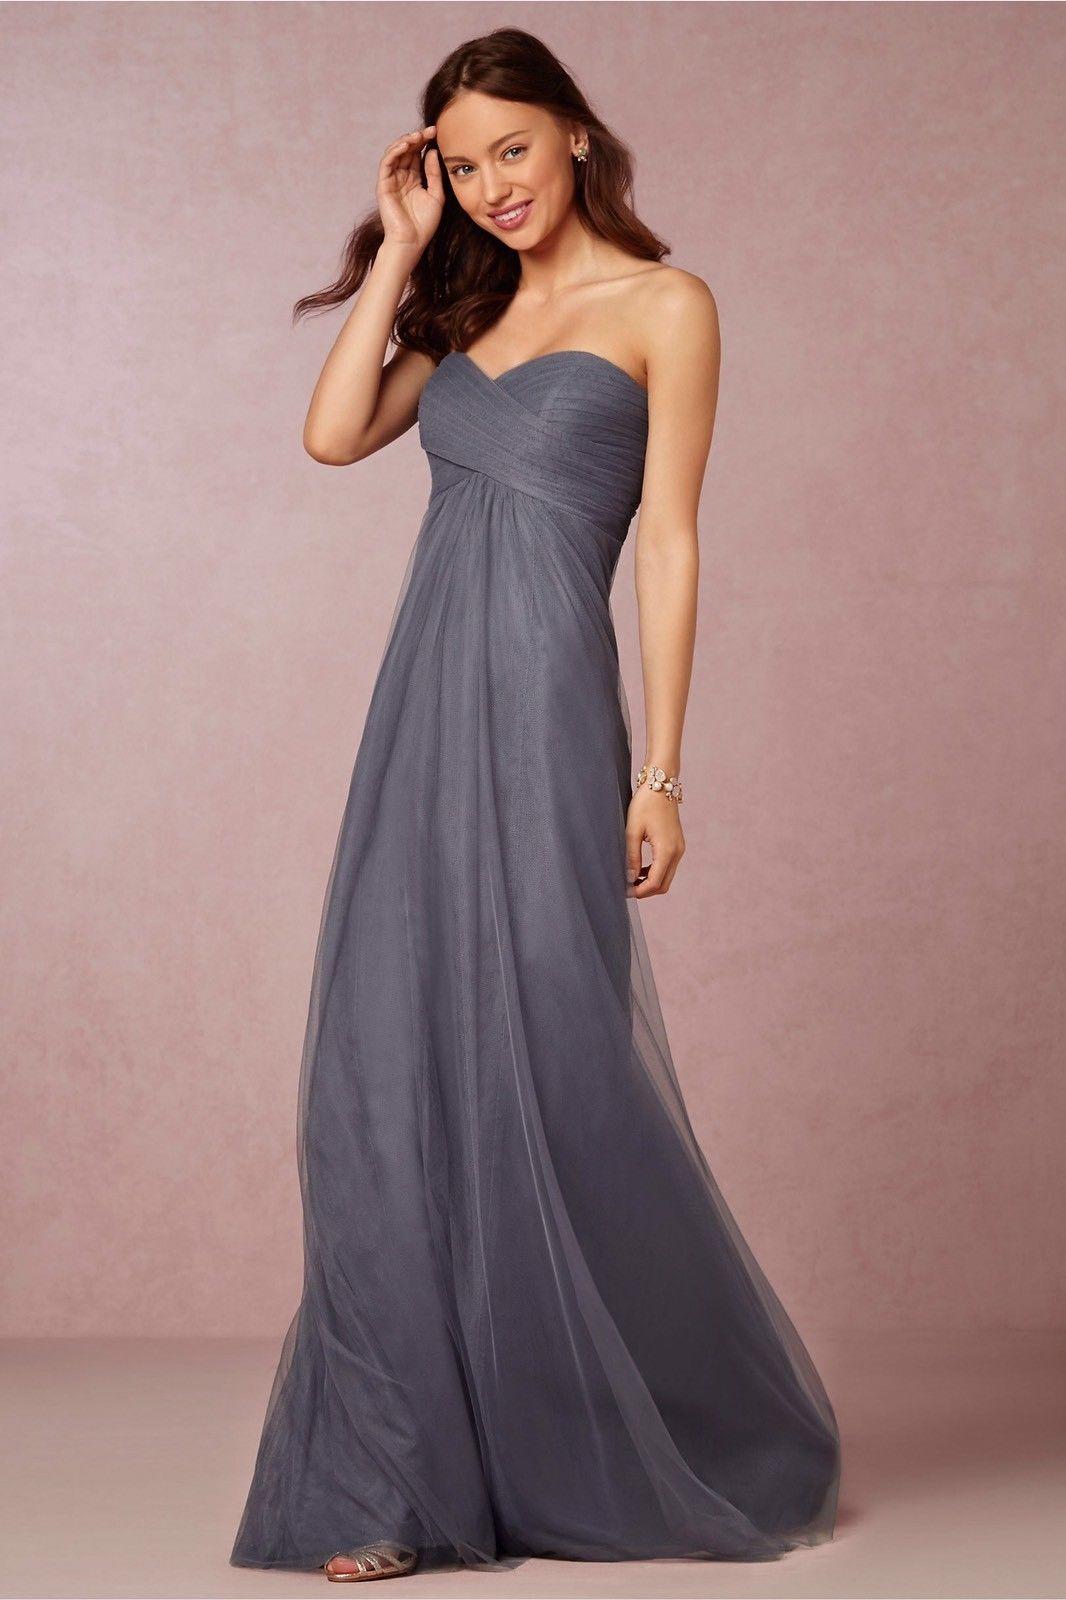 37++ Wedding gown hydrangea size ideas